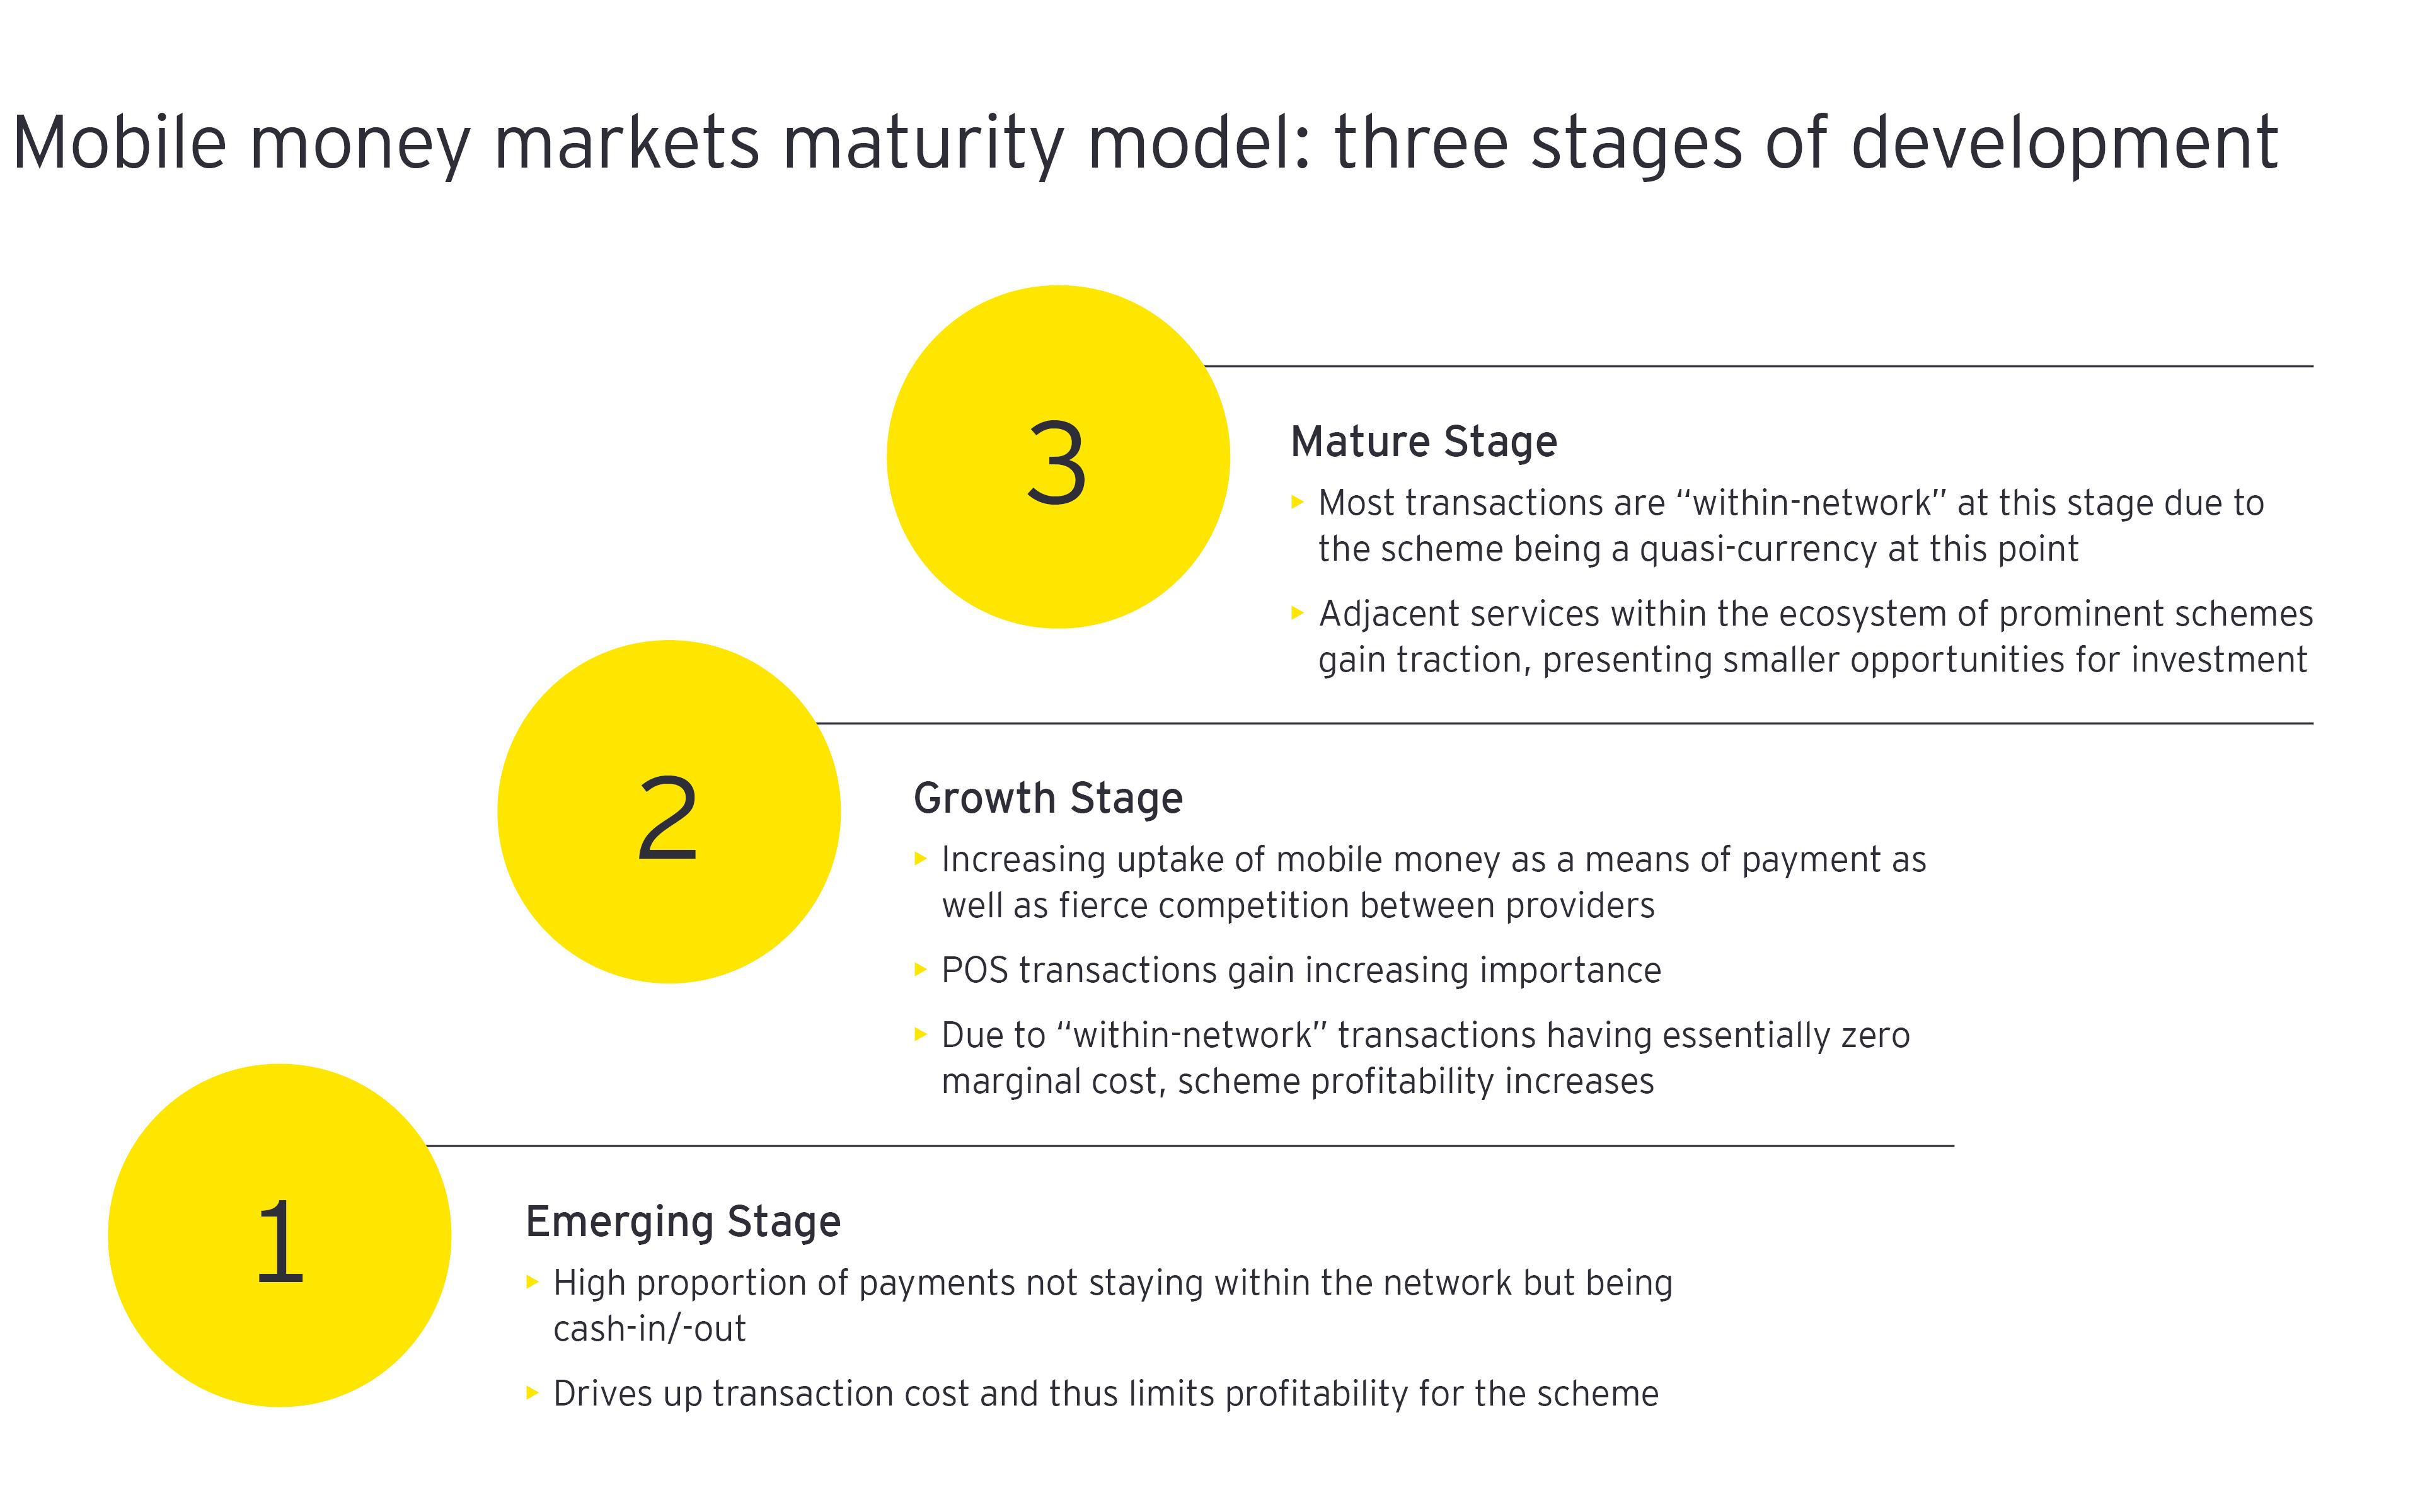 Mobile money markets maturity model